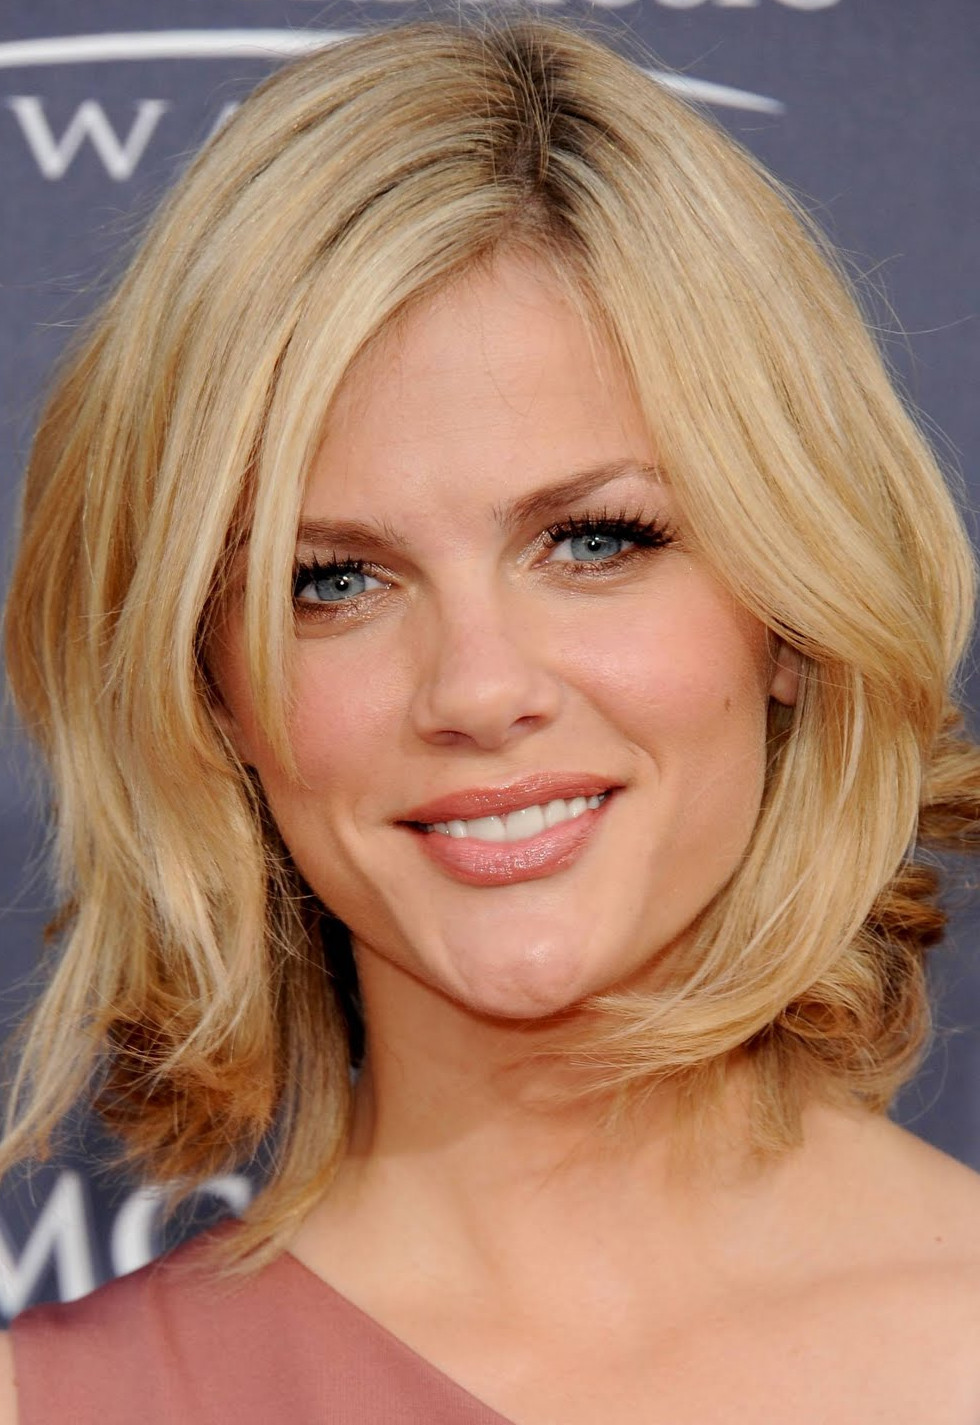 Medium Cut Hair  Layered Hairstyles Your Beauty 411